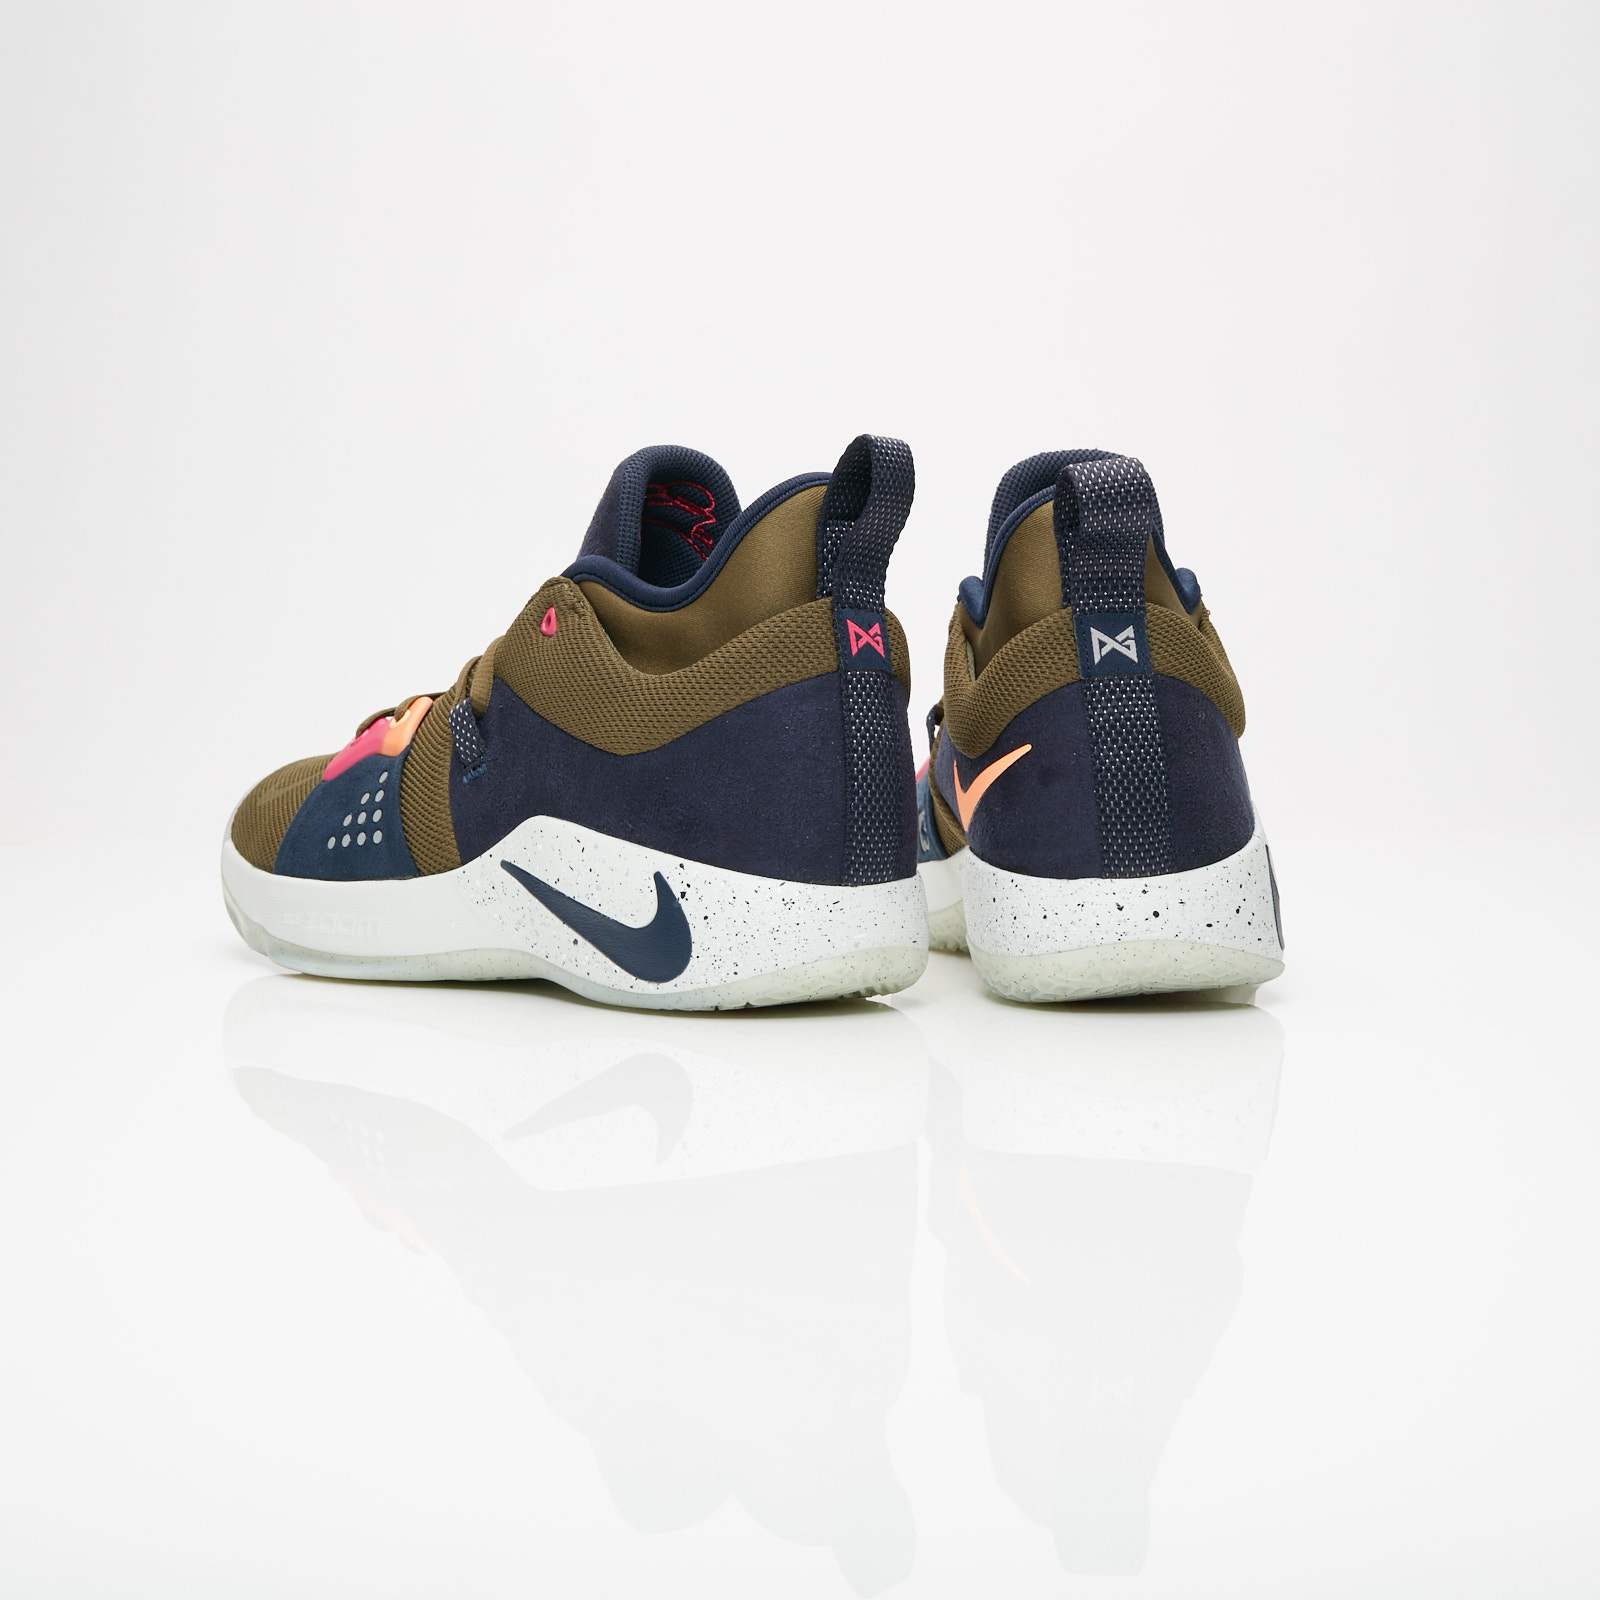 975ffbc5d45 Nike Basketball PG 2 Nike Basketball PG 2 ...